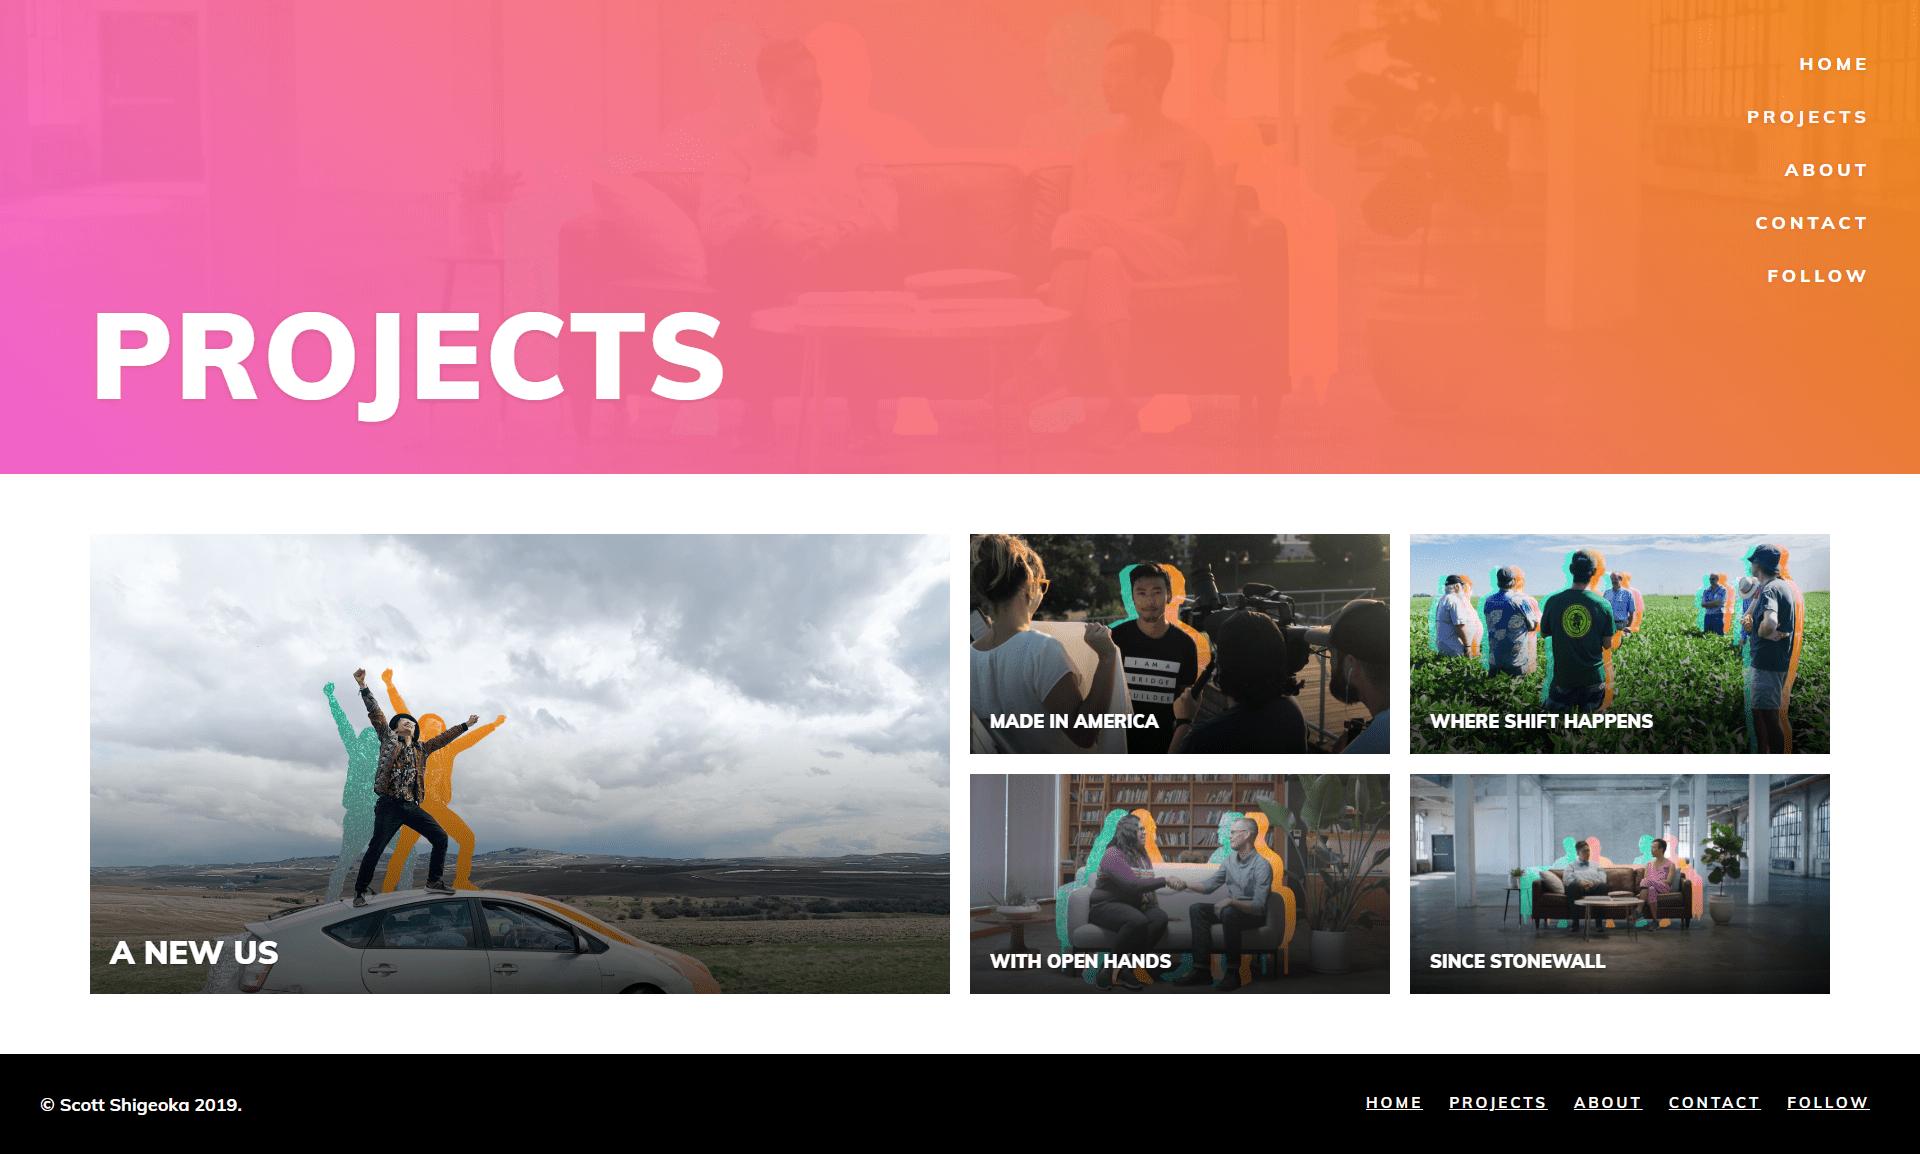 screencapture-scottshigeoka-projects-